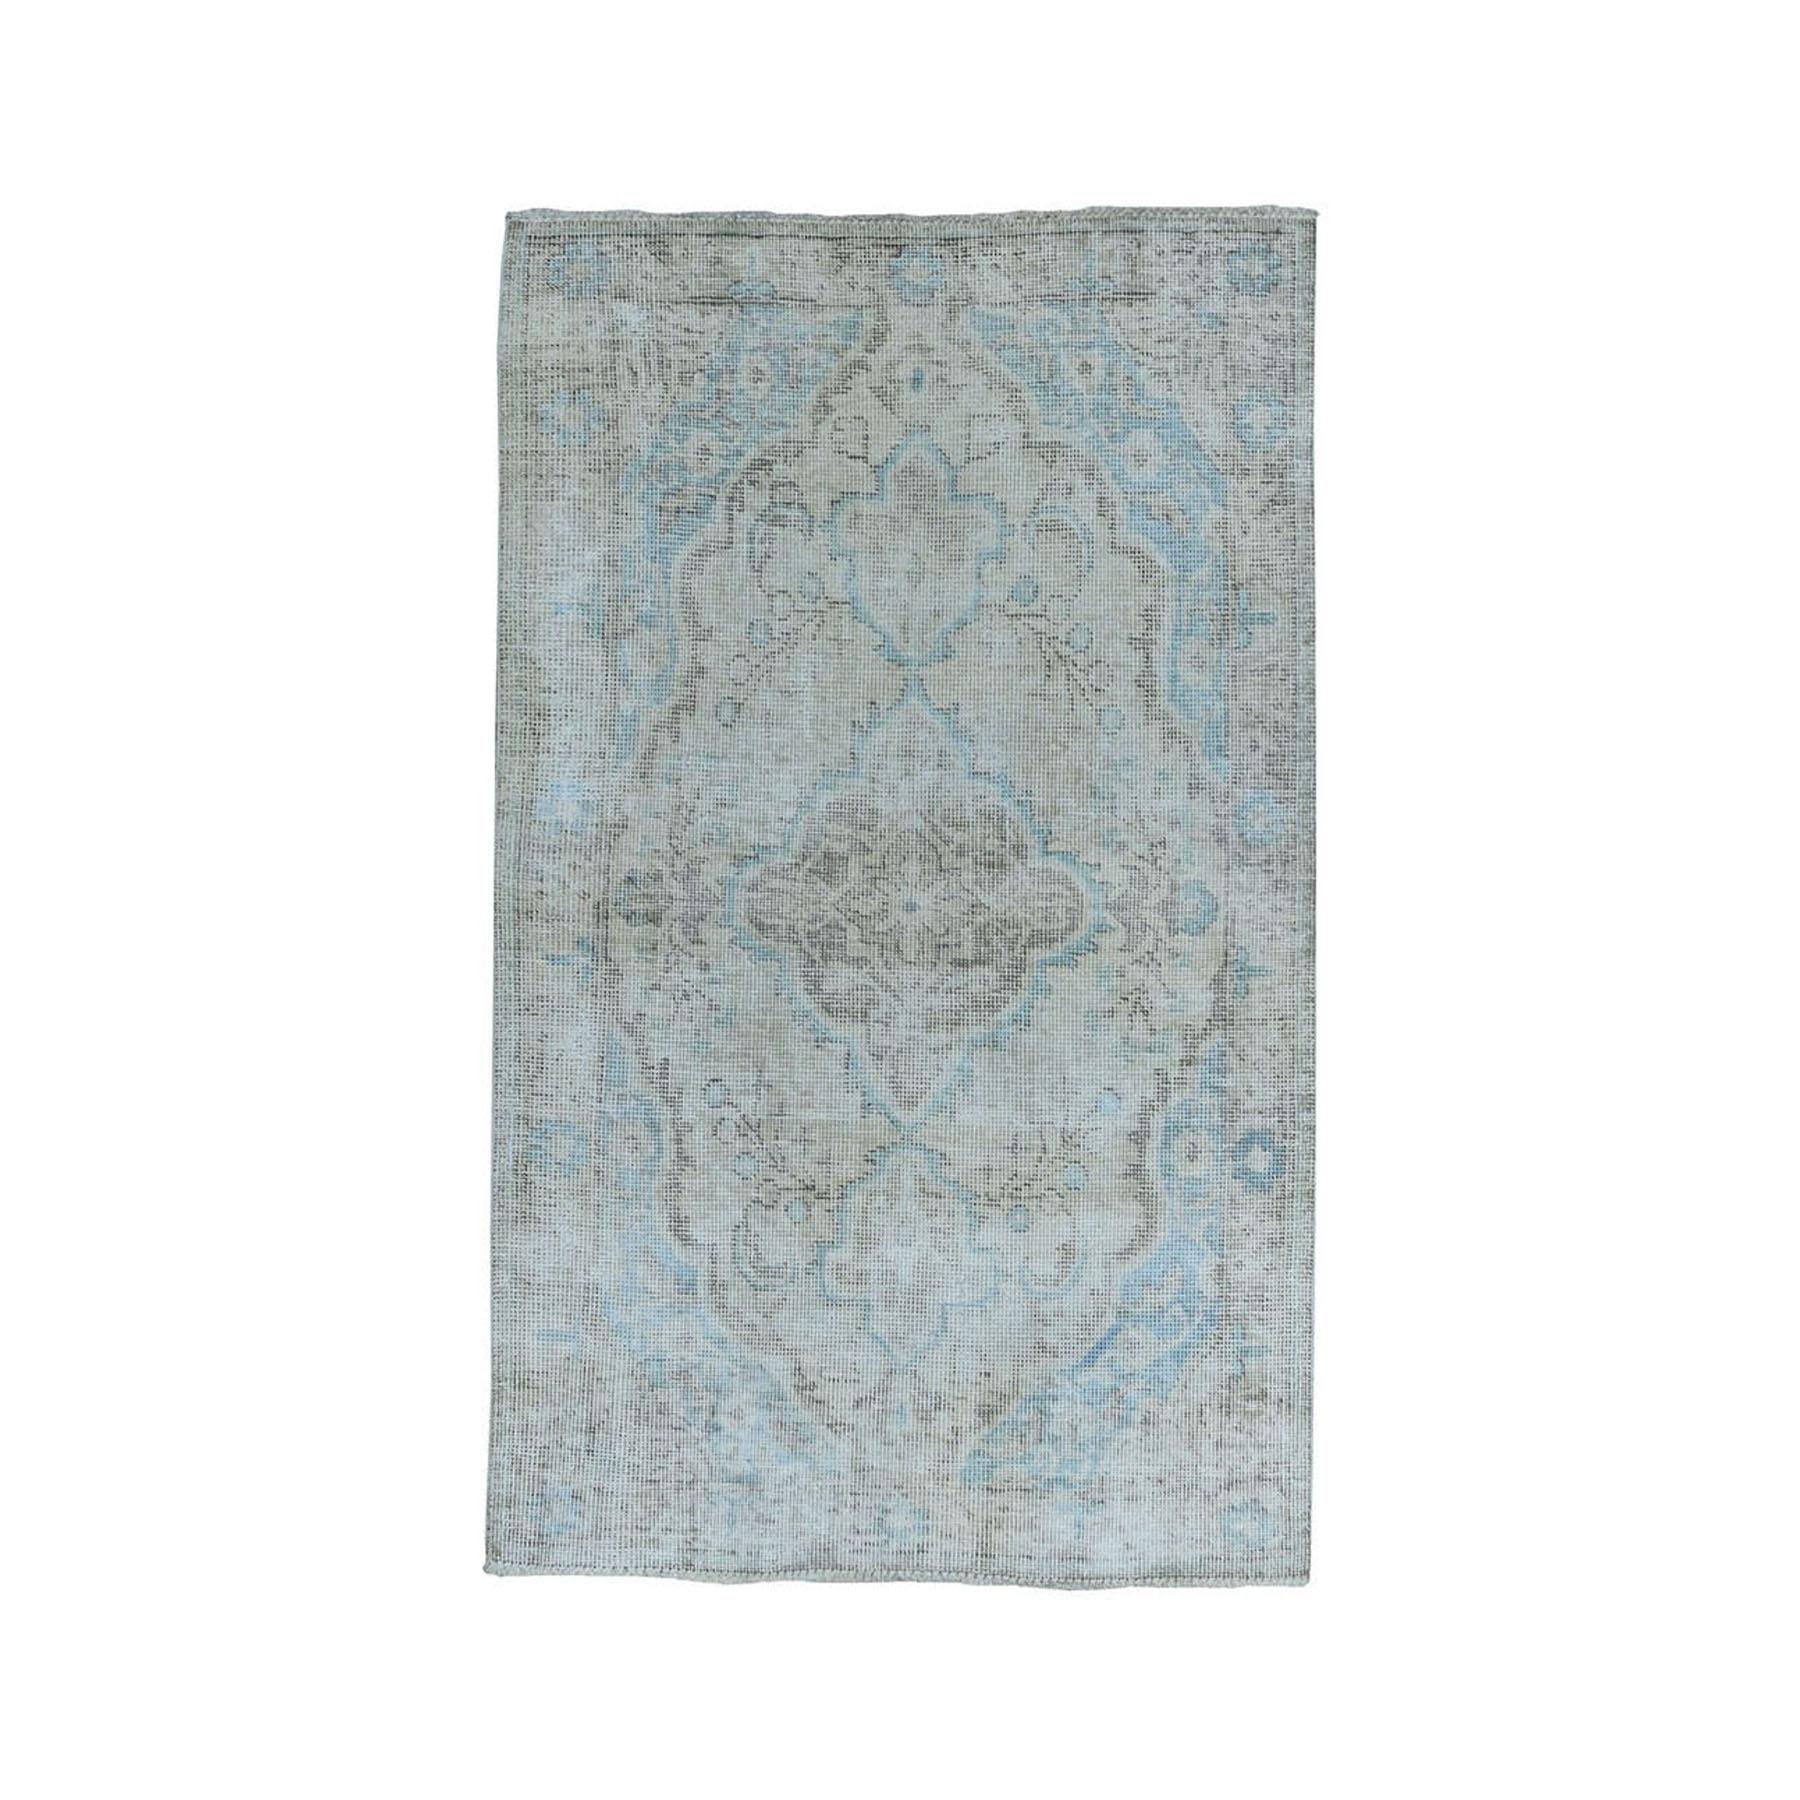 "3'X4'10"" Vintage White Wash Tabriz Worn Wool Hand-Knotted Oriental Rug moae07a8"